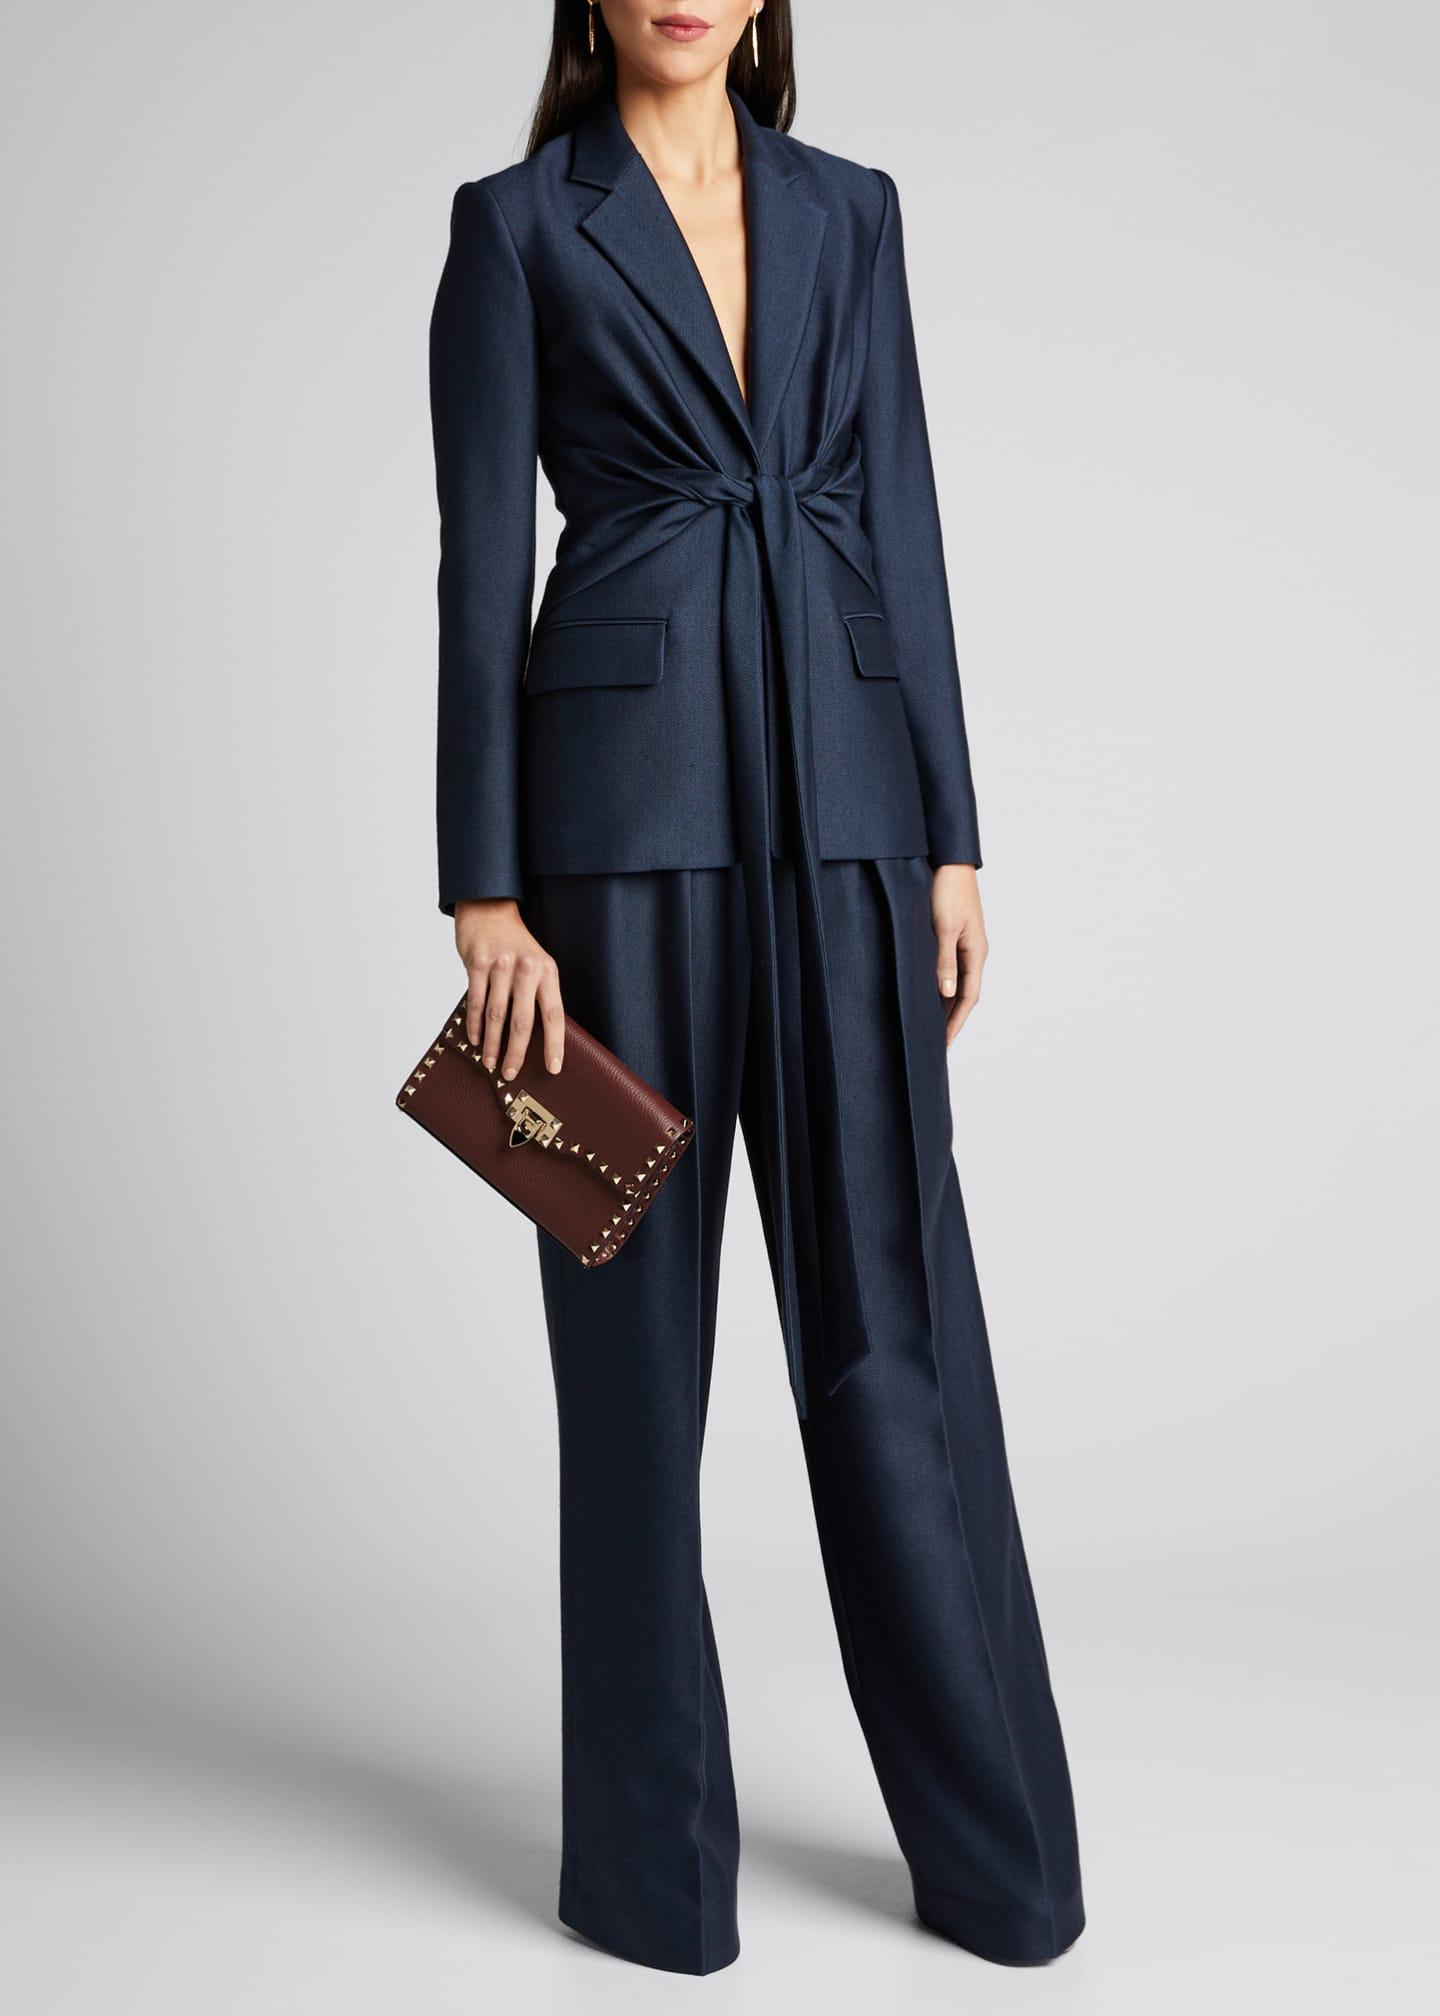 Gabriela Hearst Grant Knotted Wool-Silk Blazer